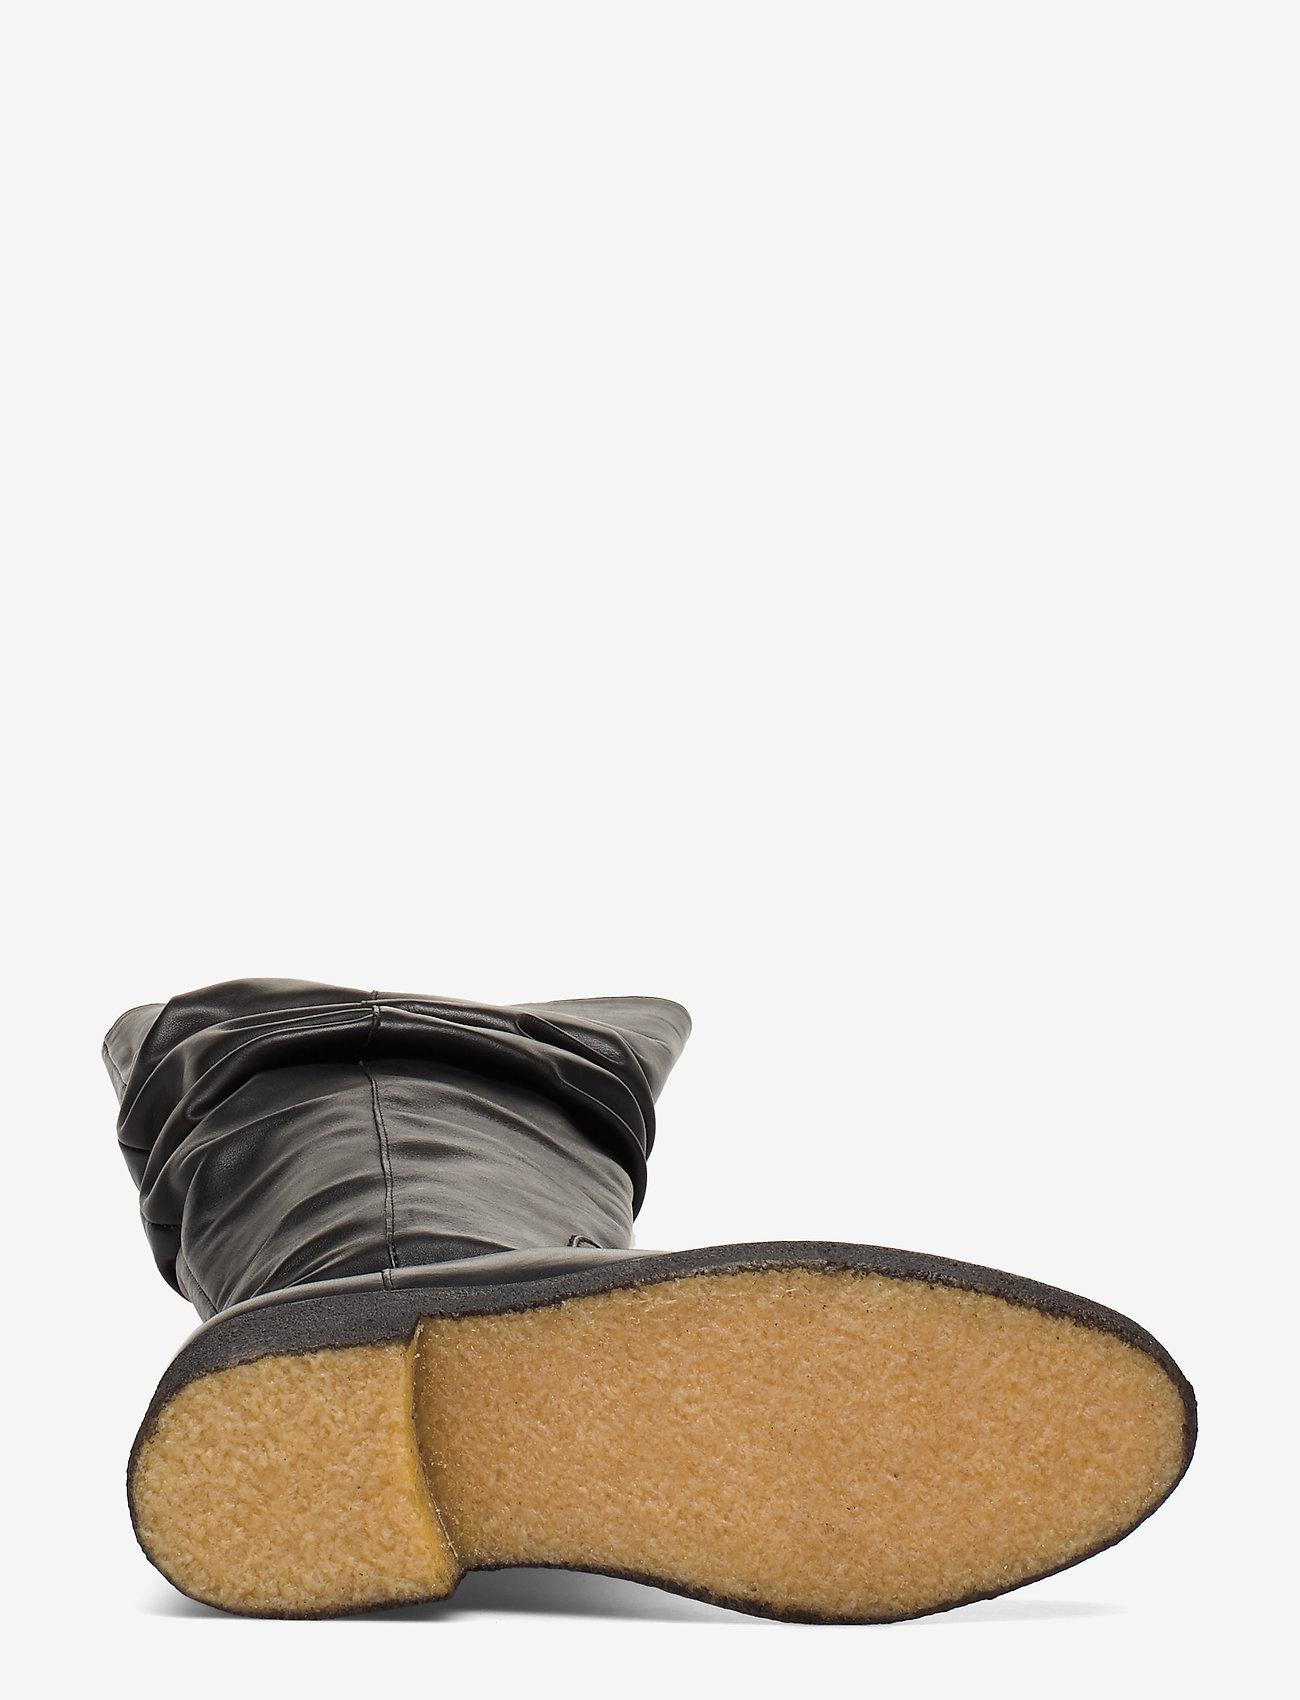 Angulus Booties - Flat With Zipper Stövlar 1604 Black